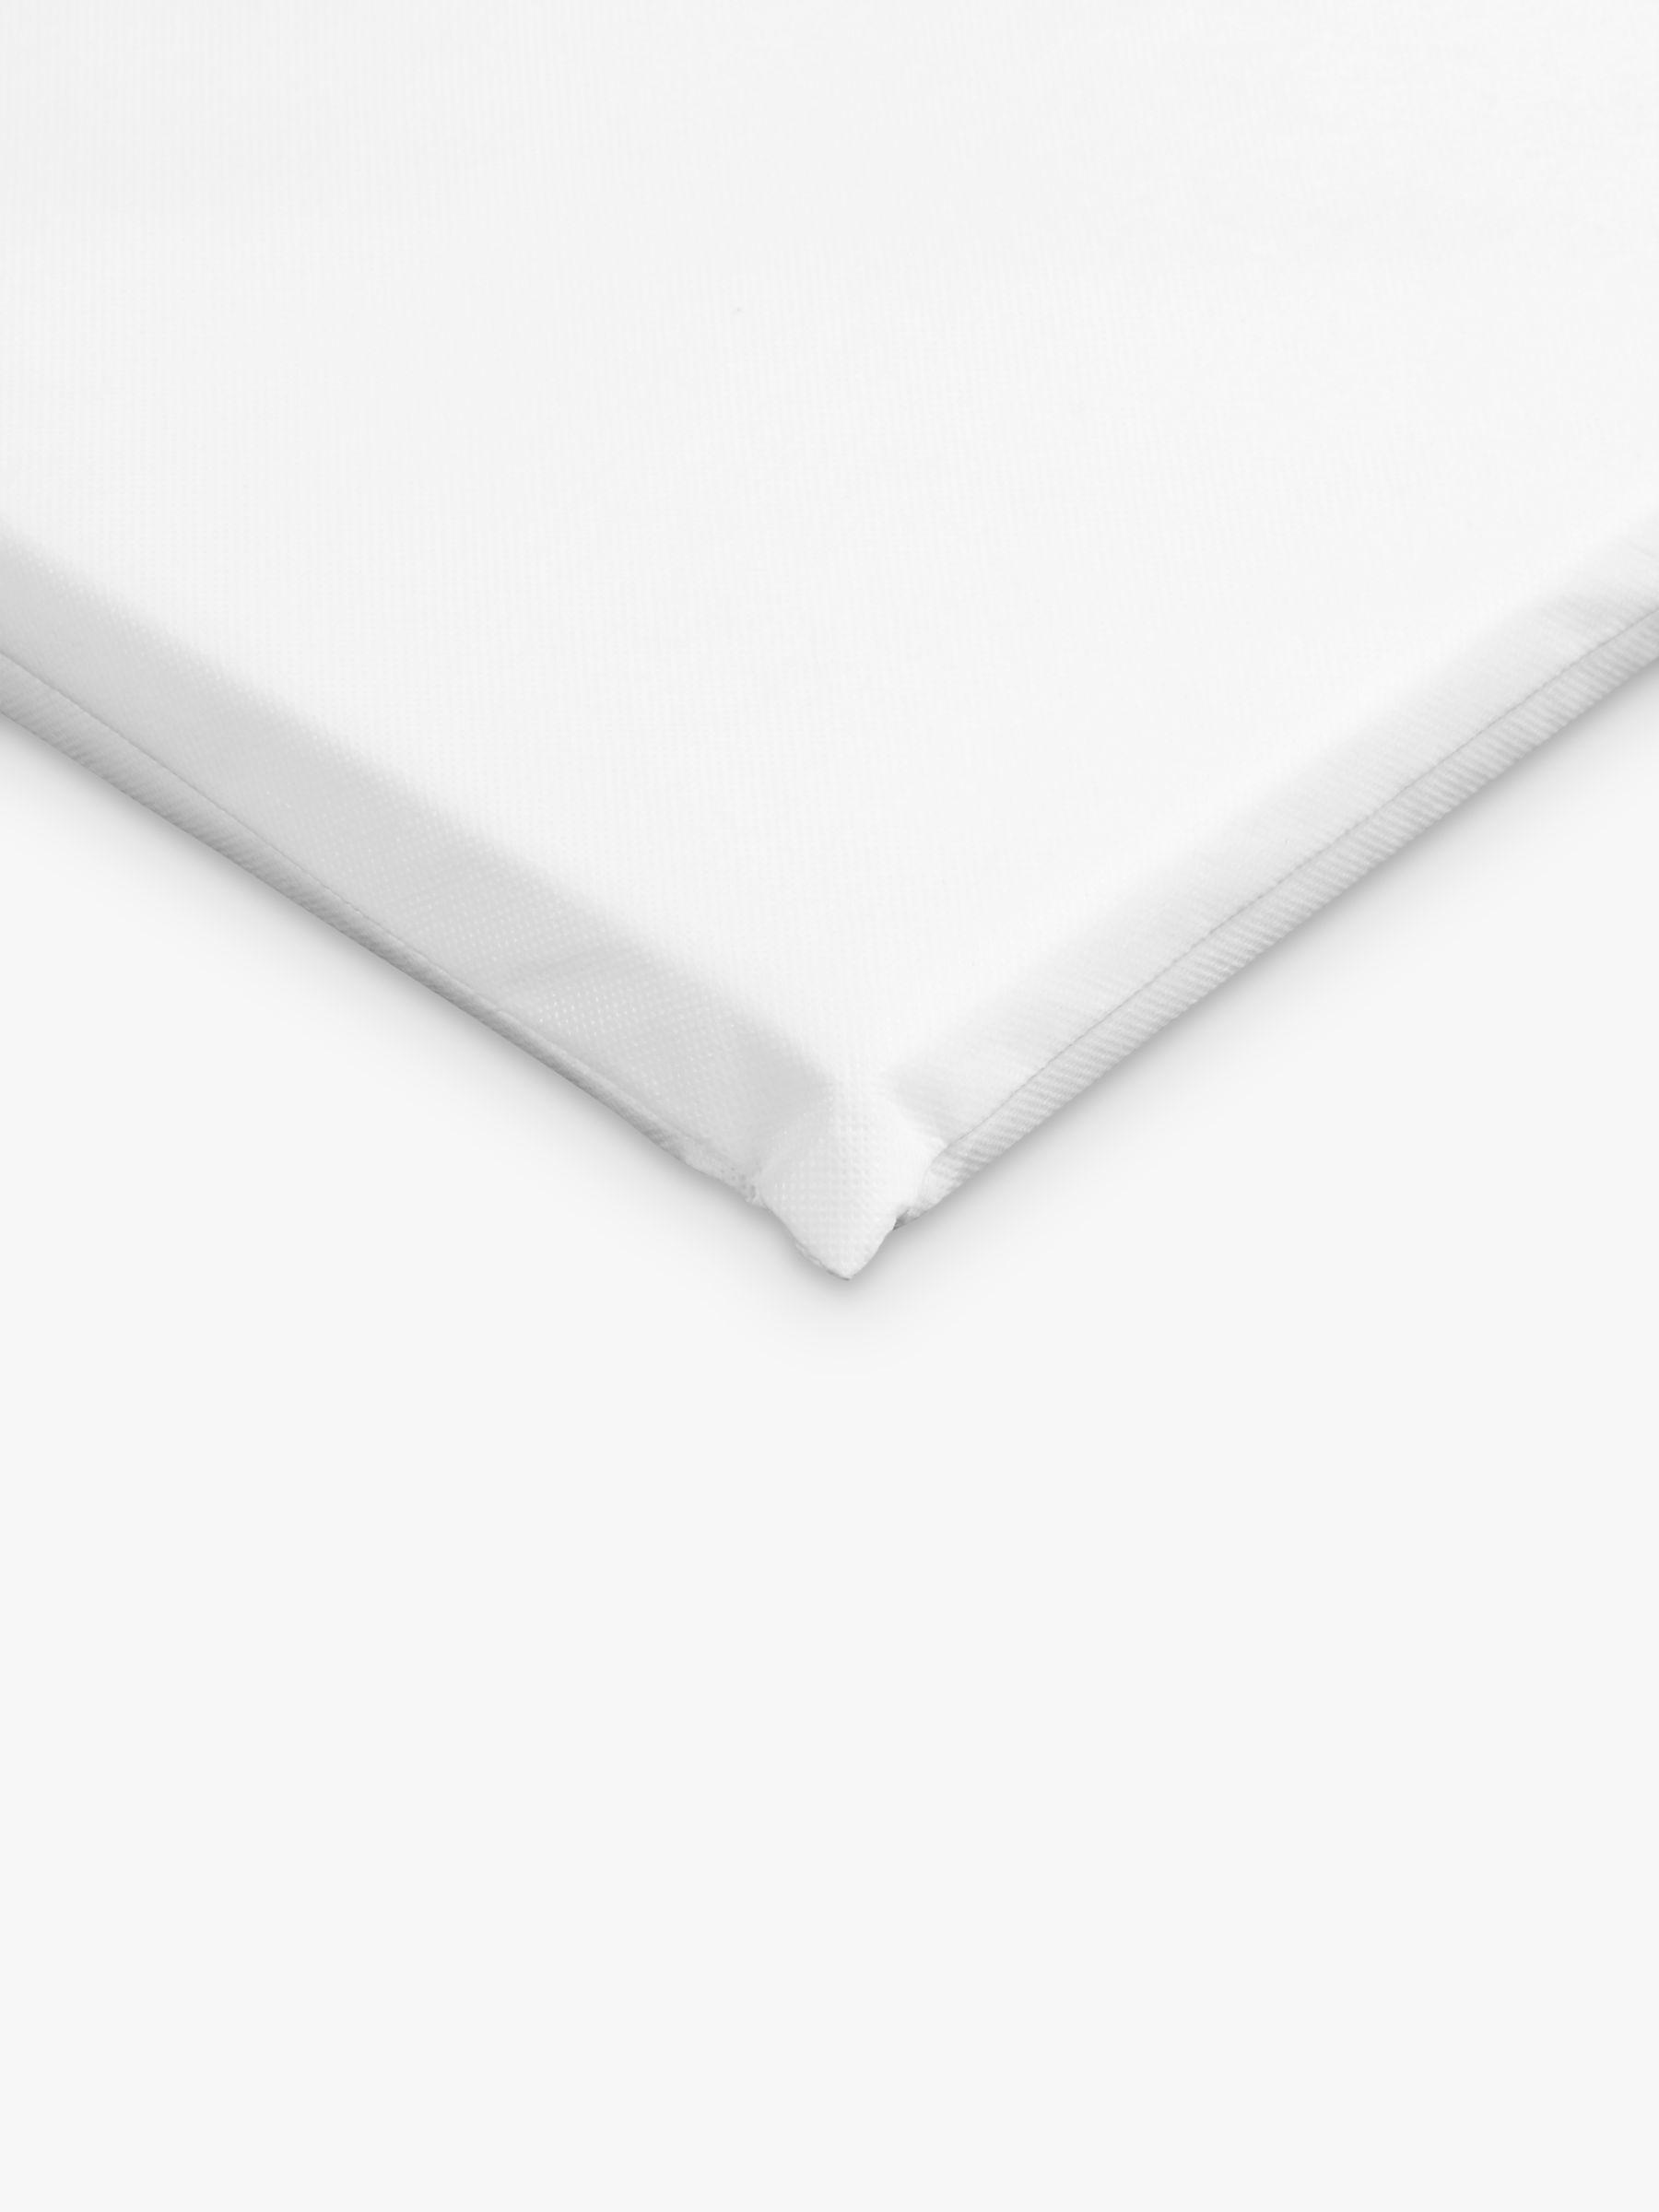 John Lewis & Partners Basic Foam Crib Mattress, 89 x 38cm